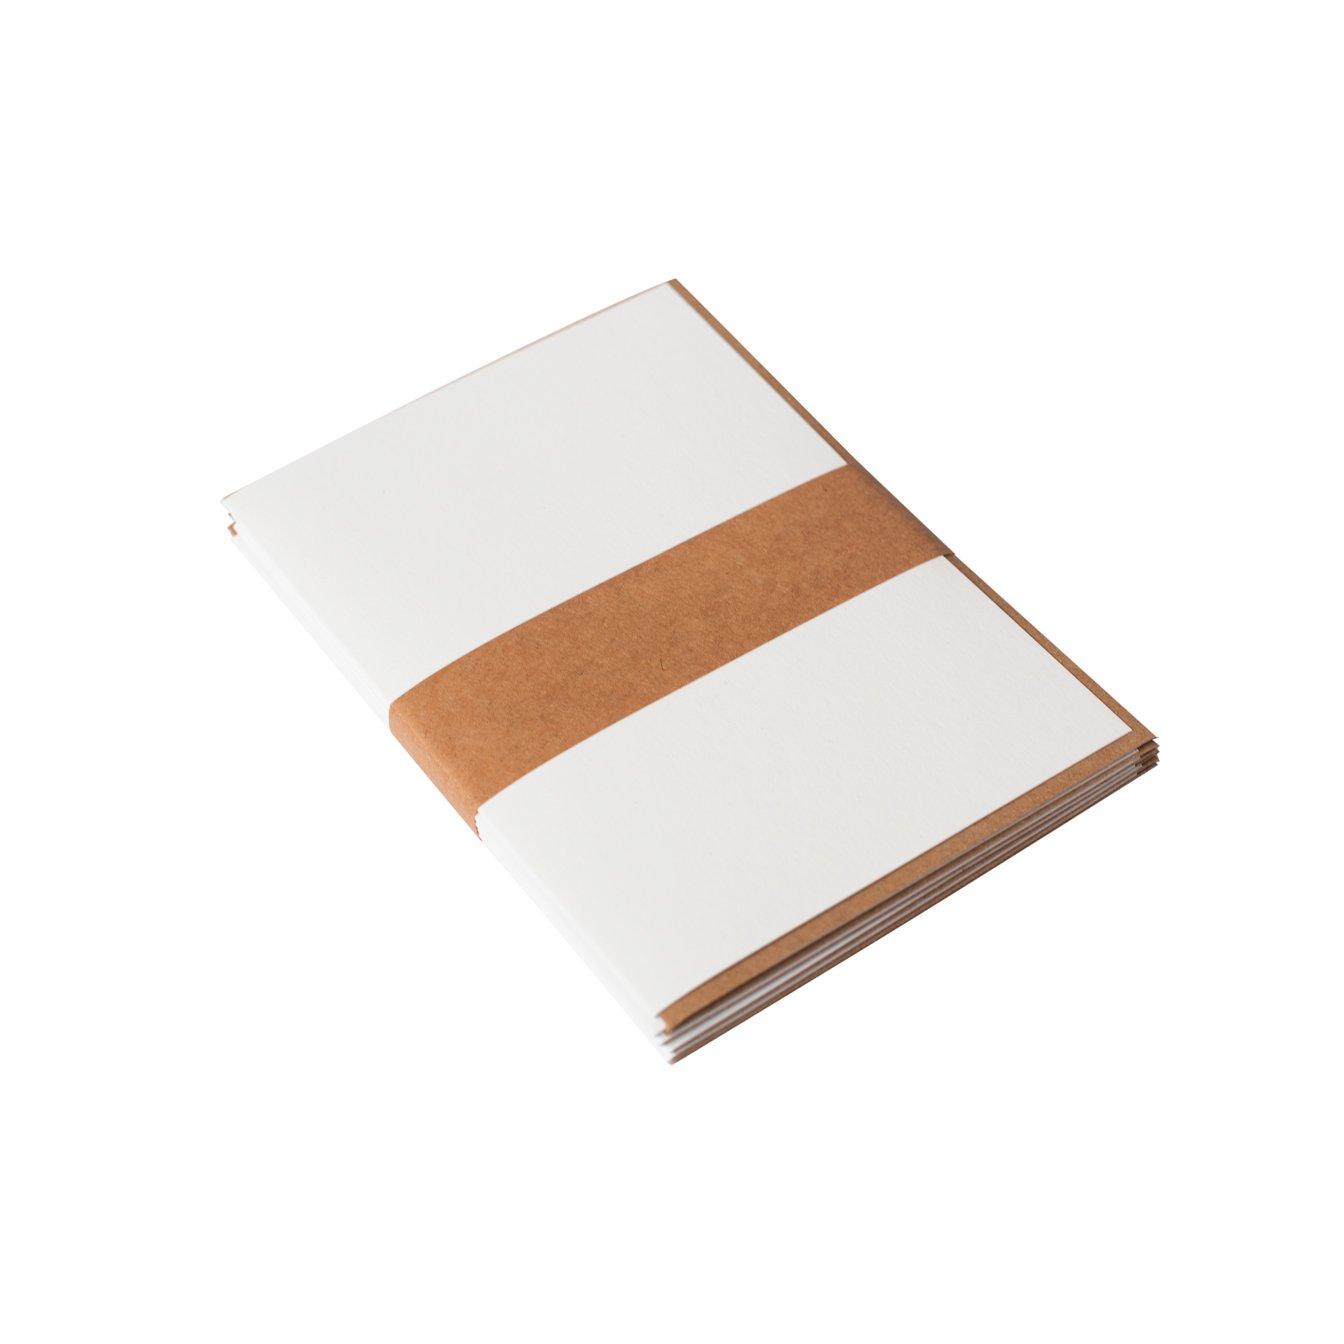 Blank Cards & Envelopes 4pk